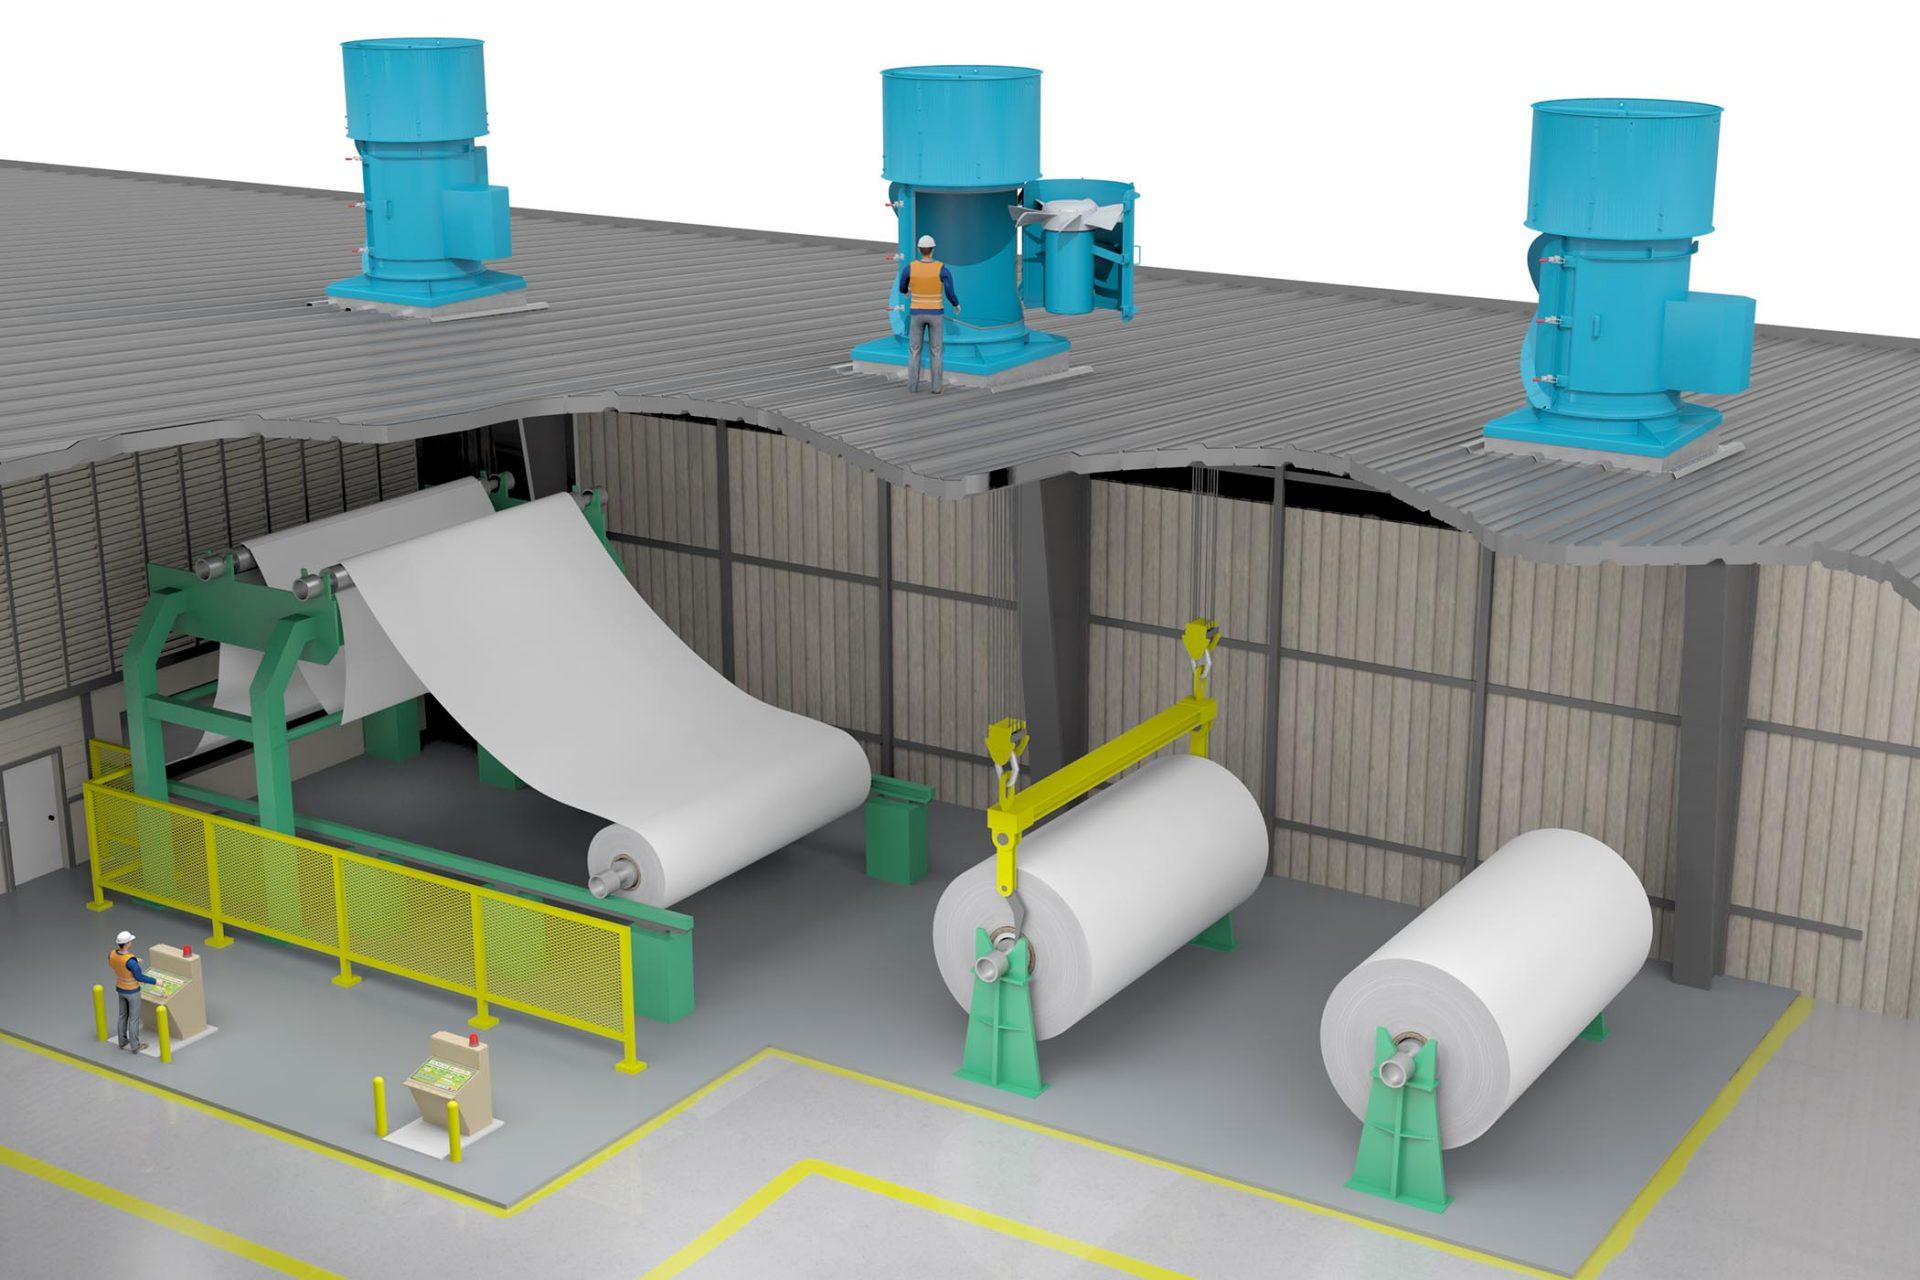 TCTA Paper Mill Axial Swingout (TCF) Modo Rendering